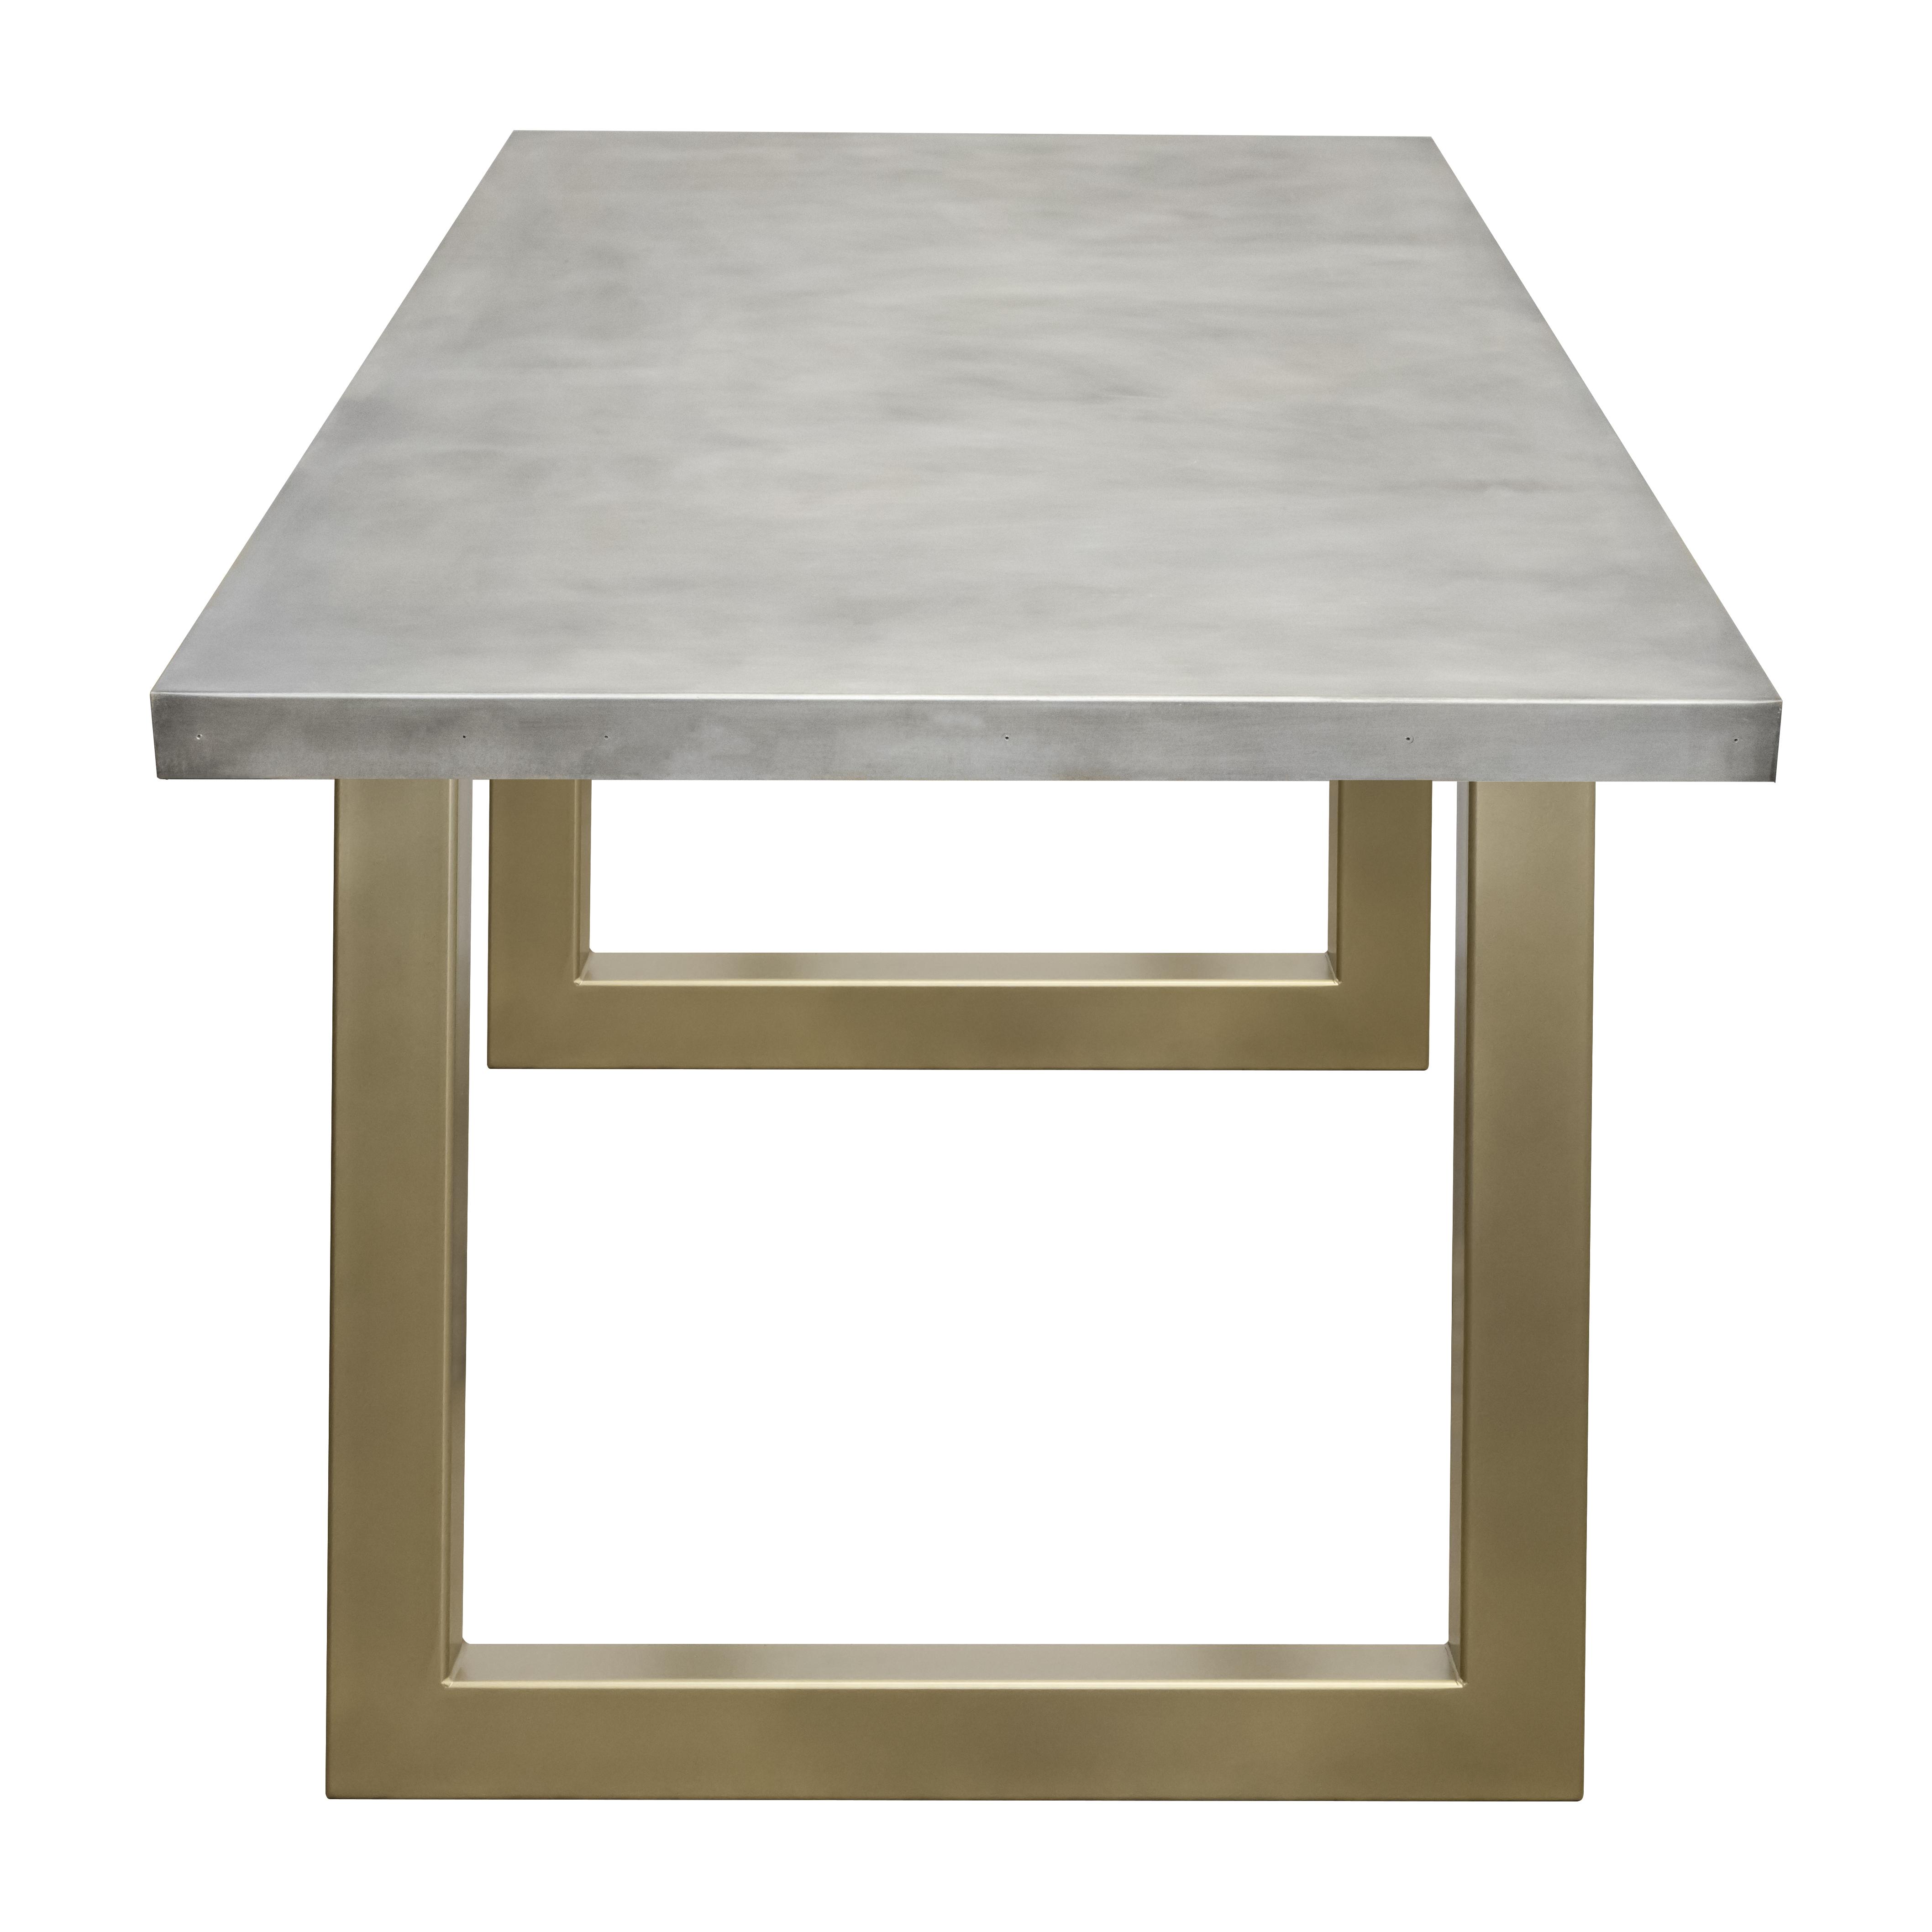 Zinc Table with Gold Sabrina Legs – Custom Metal Home